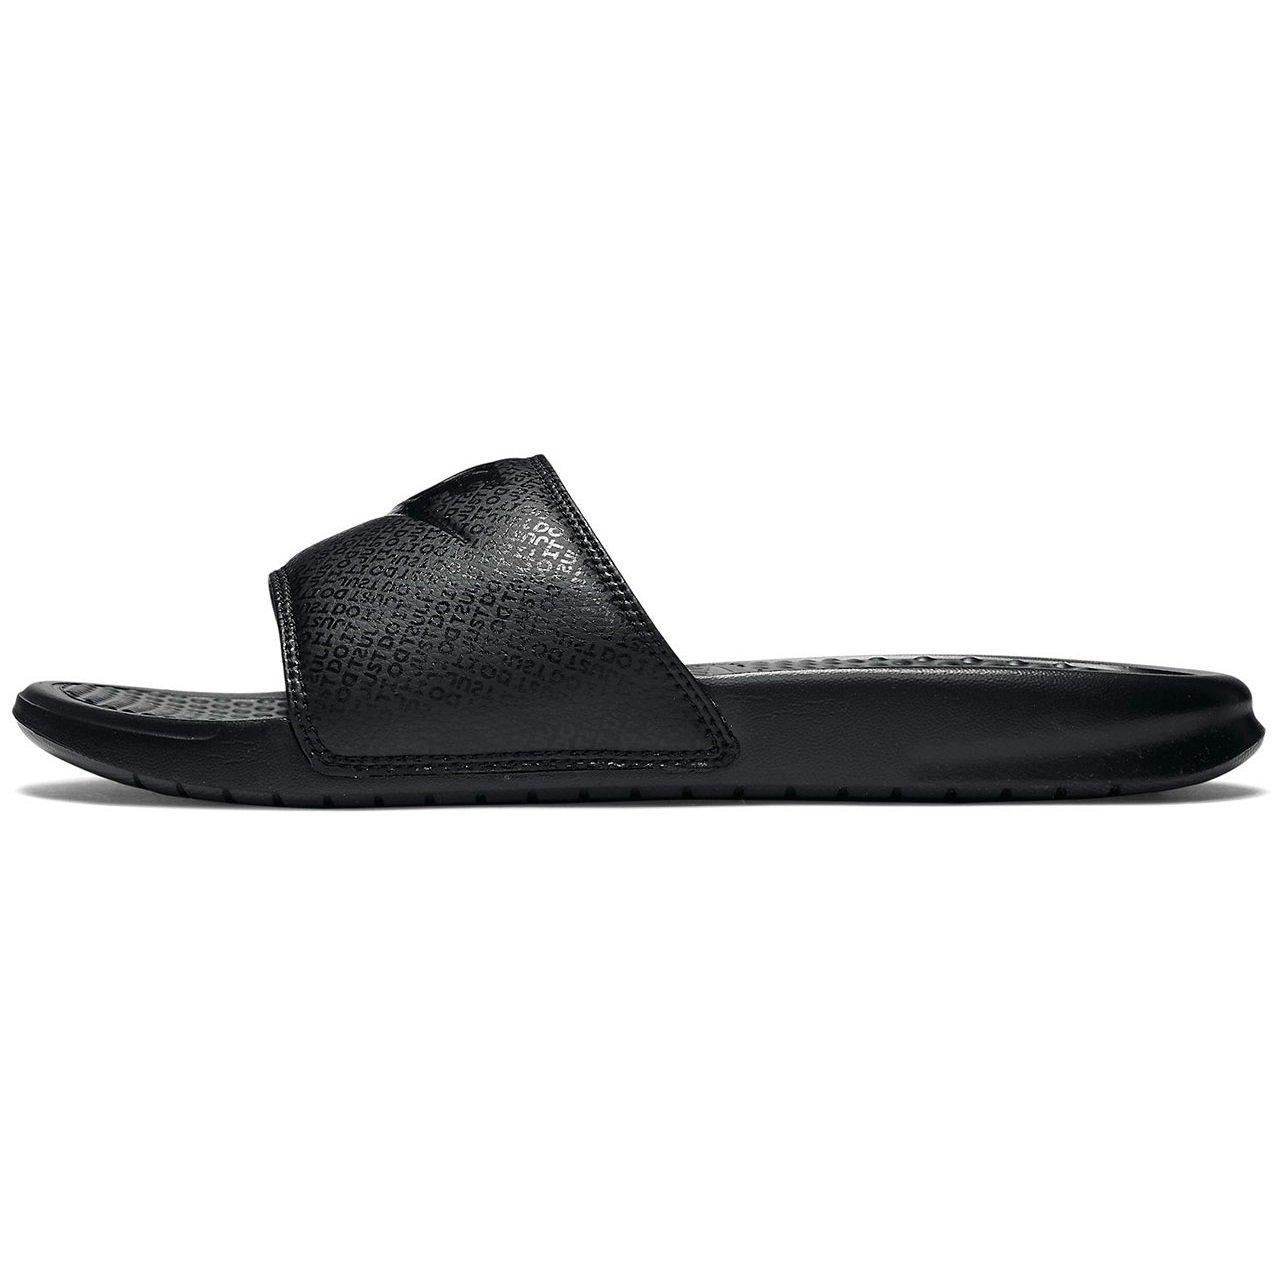 reputable site 9869f b1130 Galleon - Nike Mens Benassi JDI Black Black Black Size 14